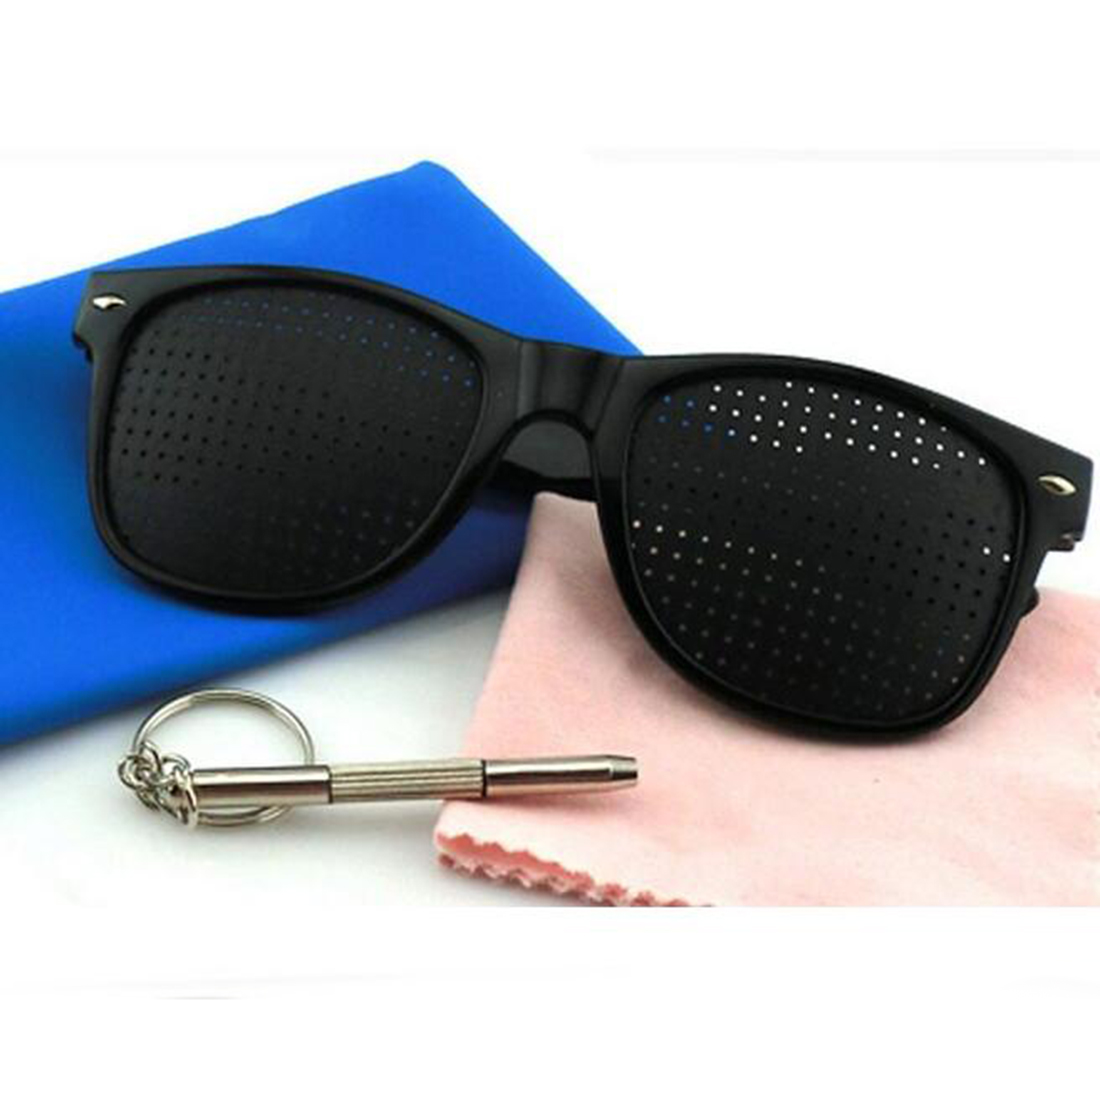 Top Venda Vision Care Pin Buraco óculos de Sol Das Mulheres Dos Homens  Anti-miopia Olhos Exercício Óculos Visão Improver Naturais Óculos Stenopeic 1ea06a4785